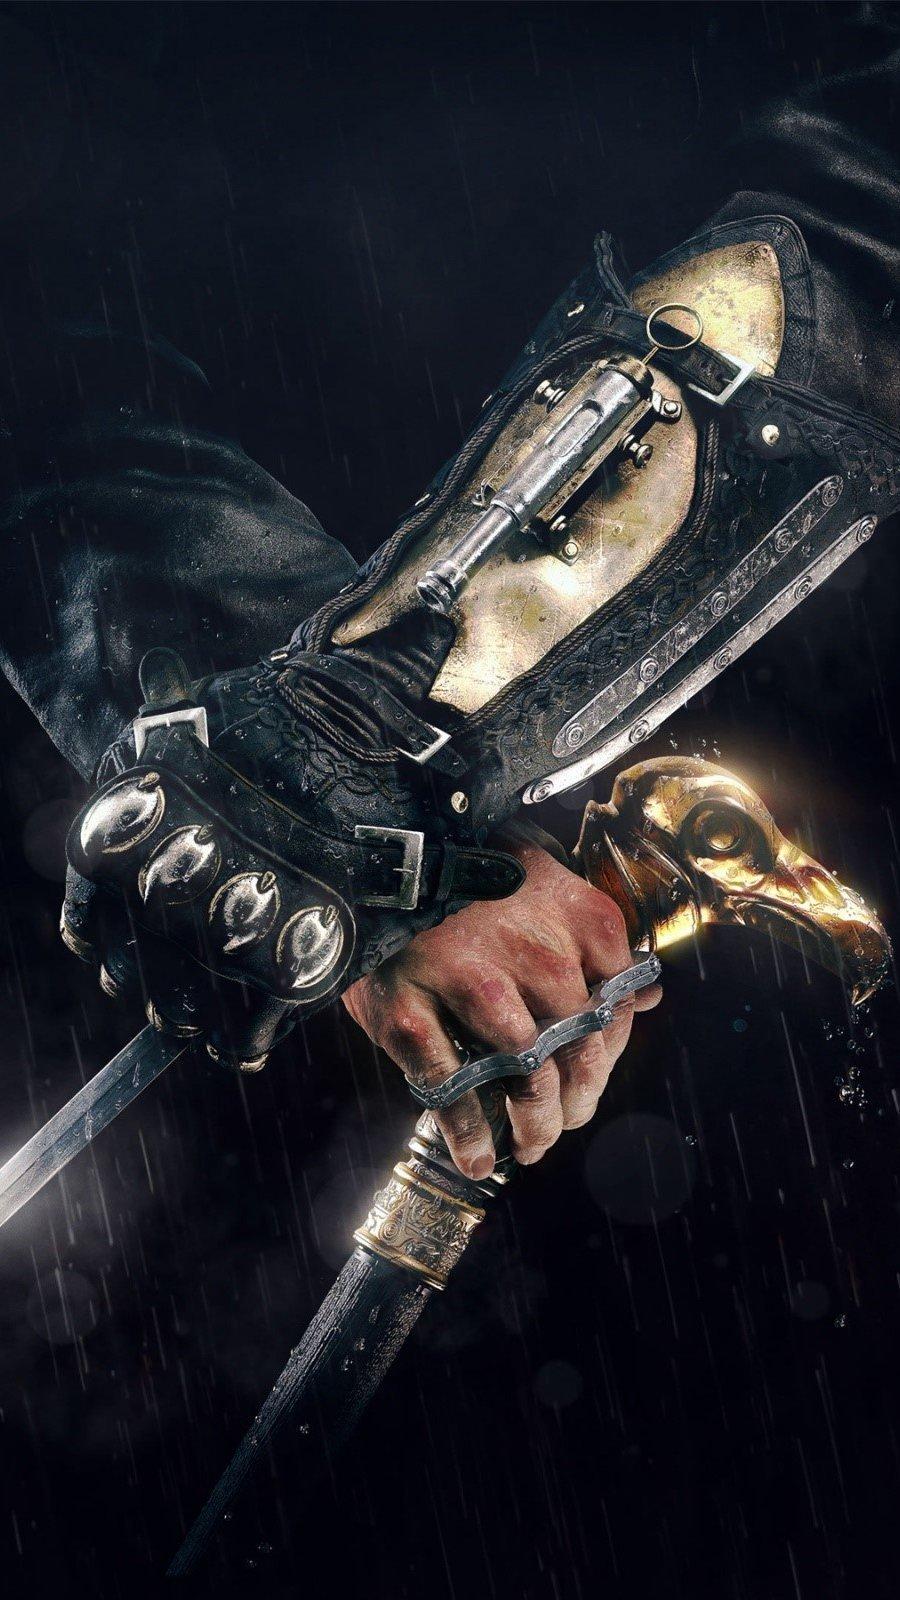 Fondos de pantalla Juego del 2015 Assassins Creed Syndicate Vertical